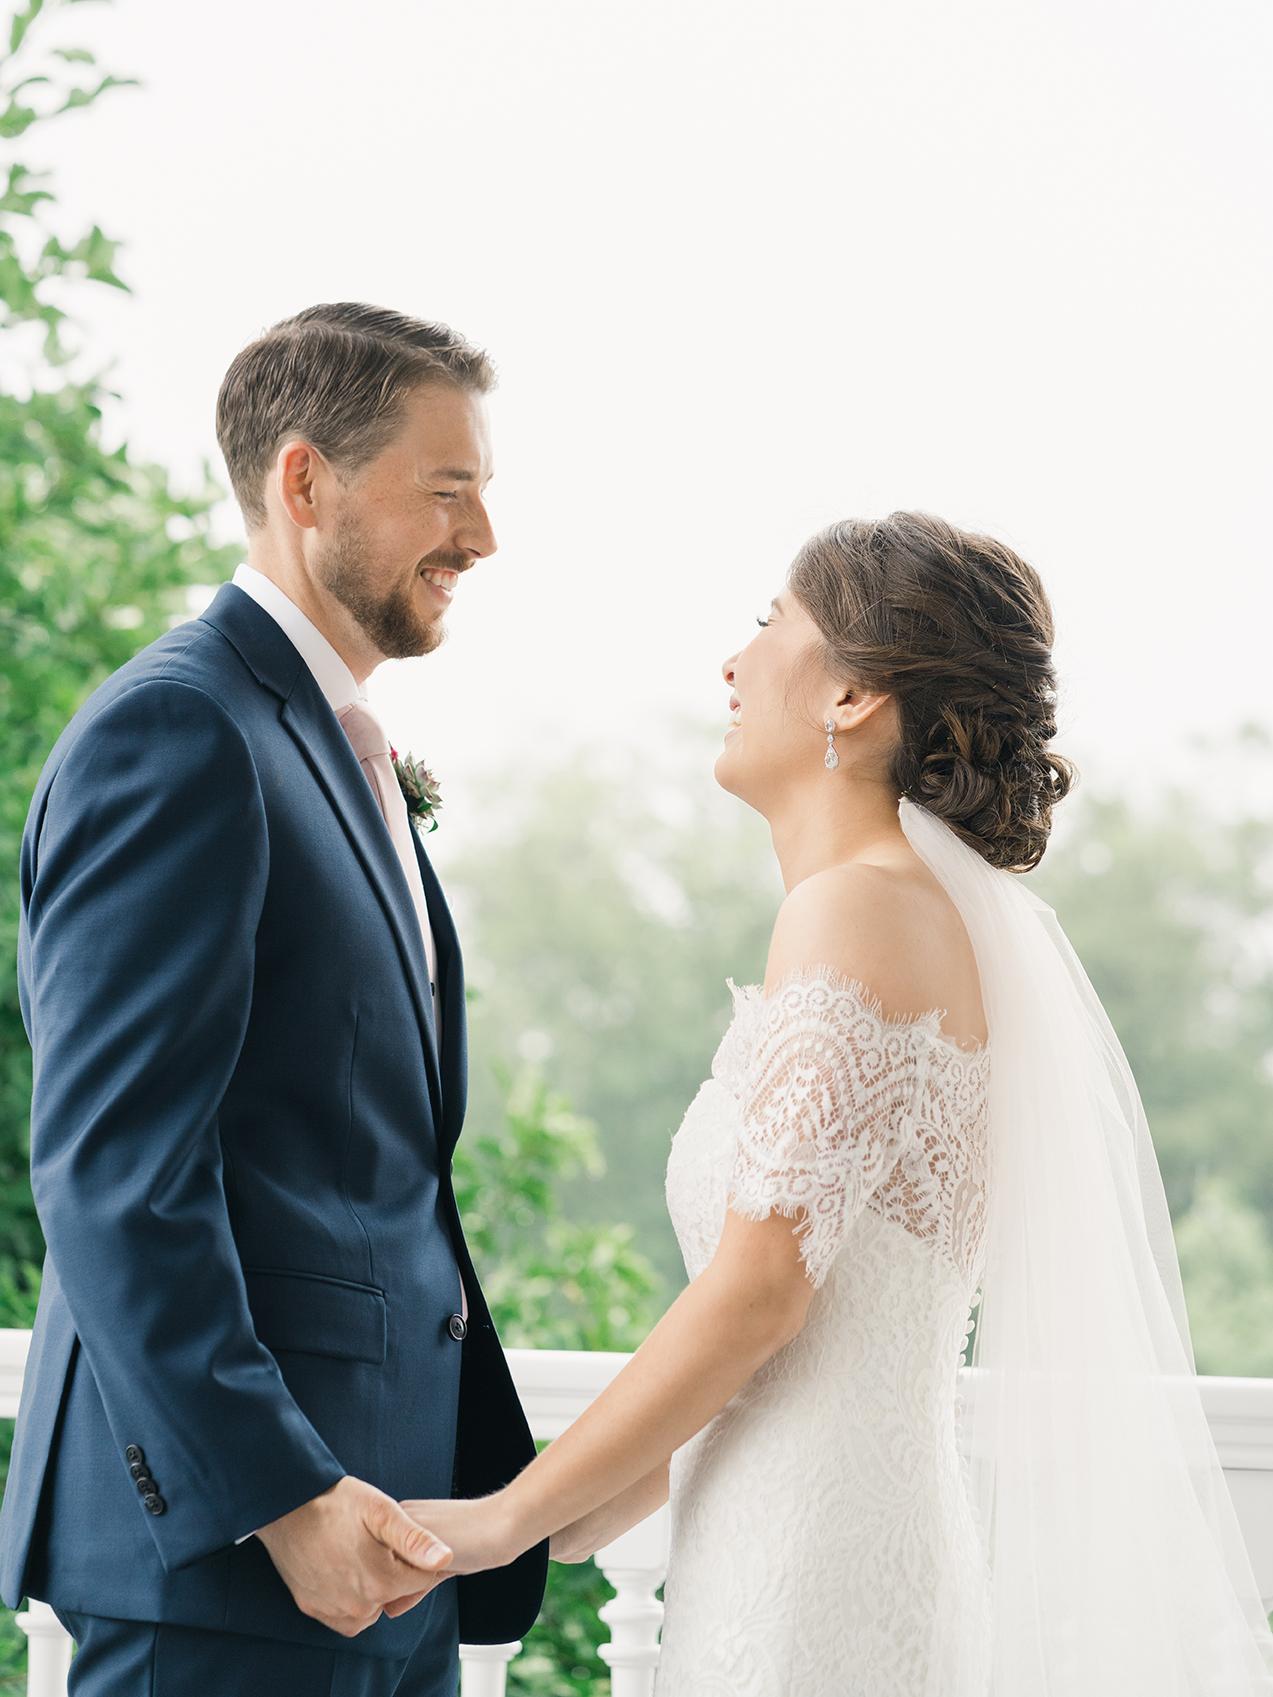 hannah-cochran-photography-joe-and-susan-wedding-42.jpg